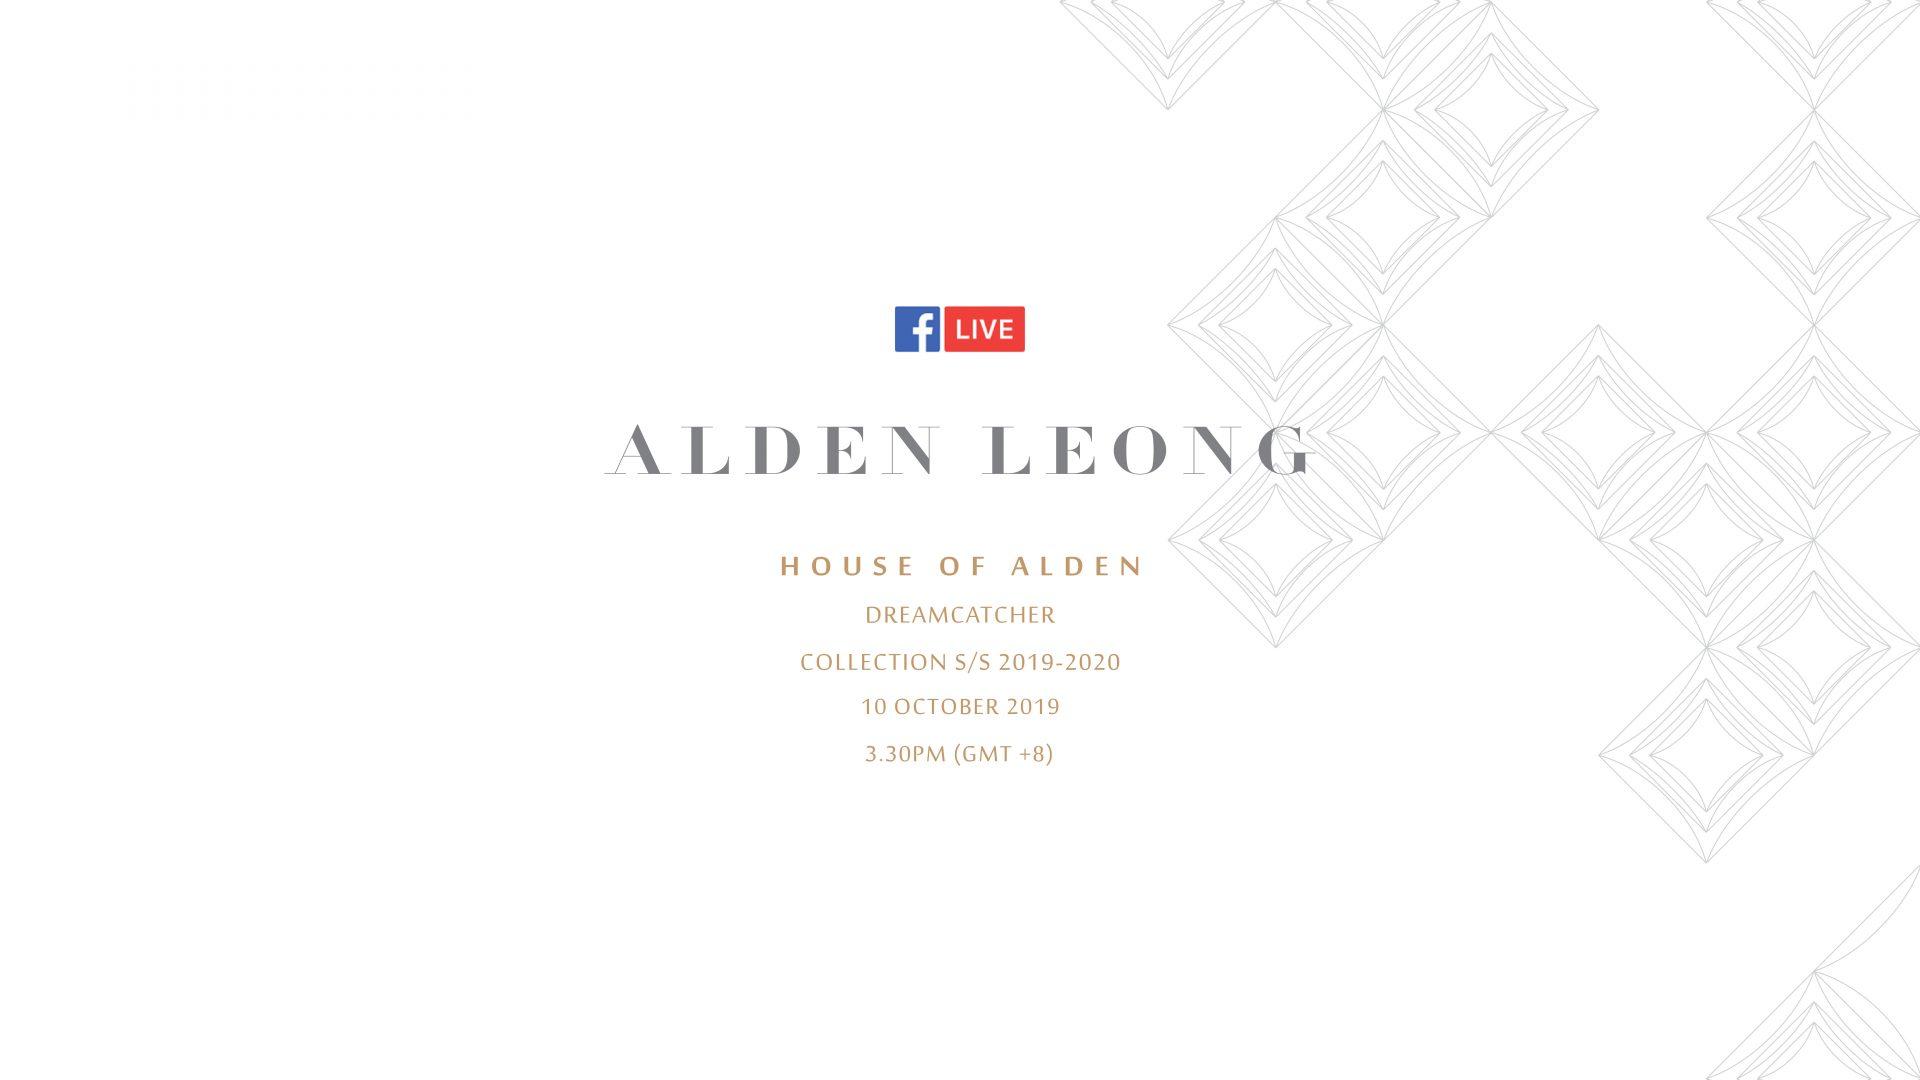 HOUSE of ALDEN Dreamcatcher Bridal Spring/Summer 2020 Collection